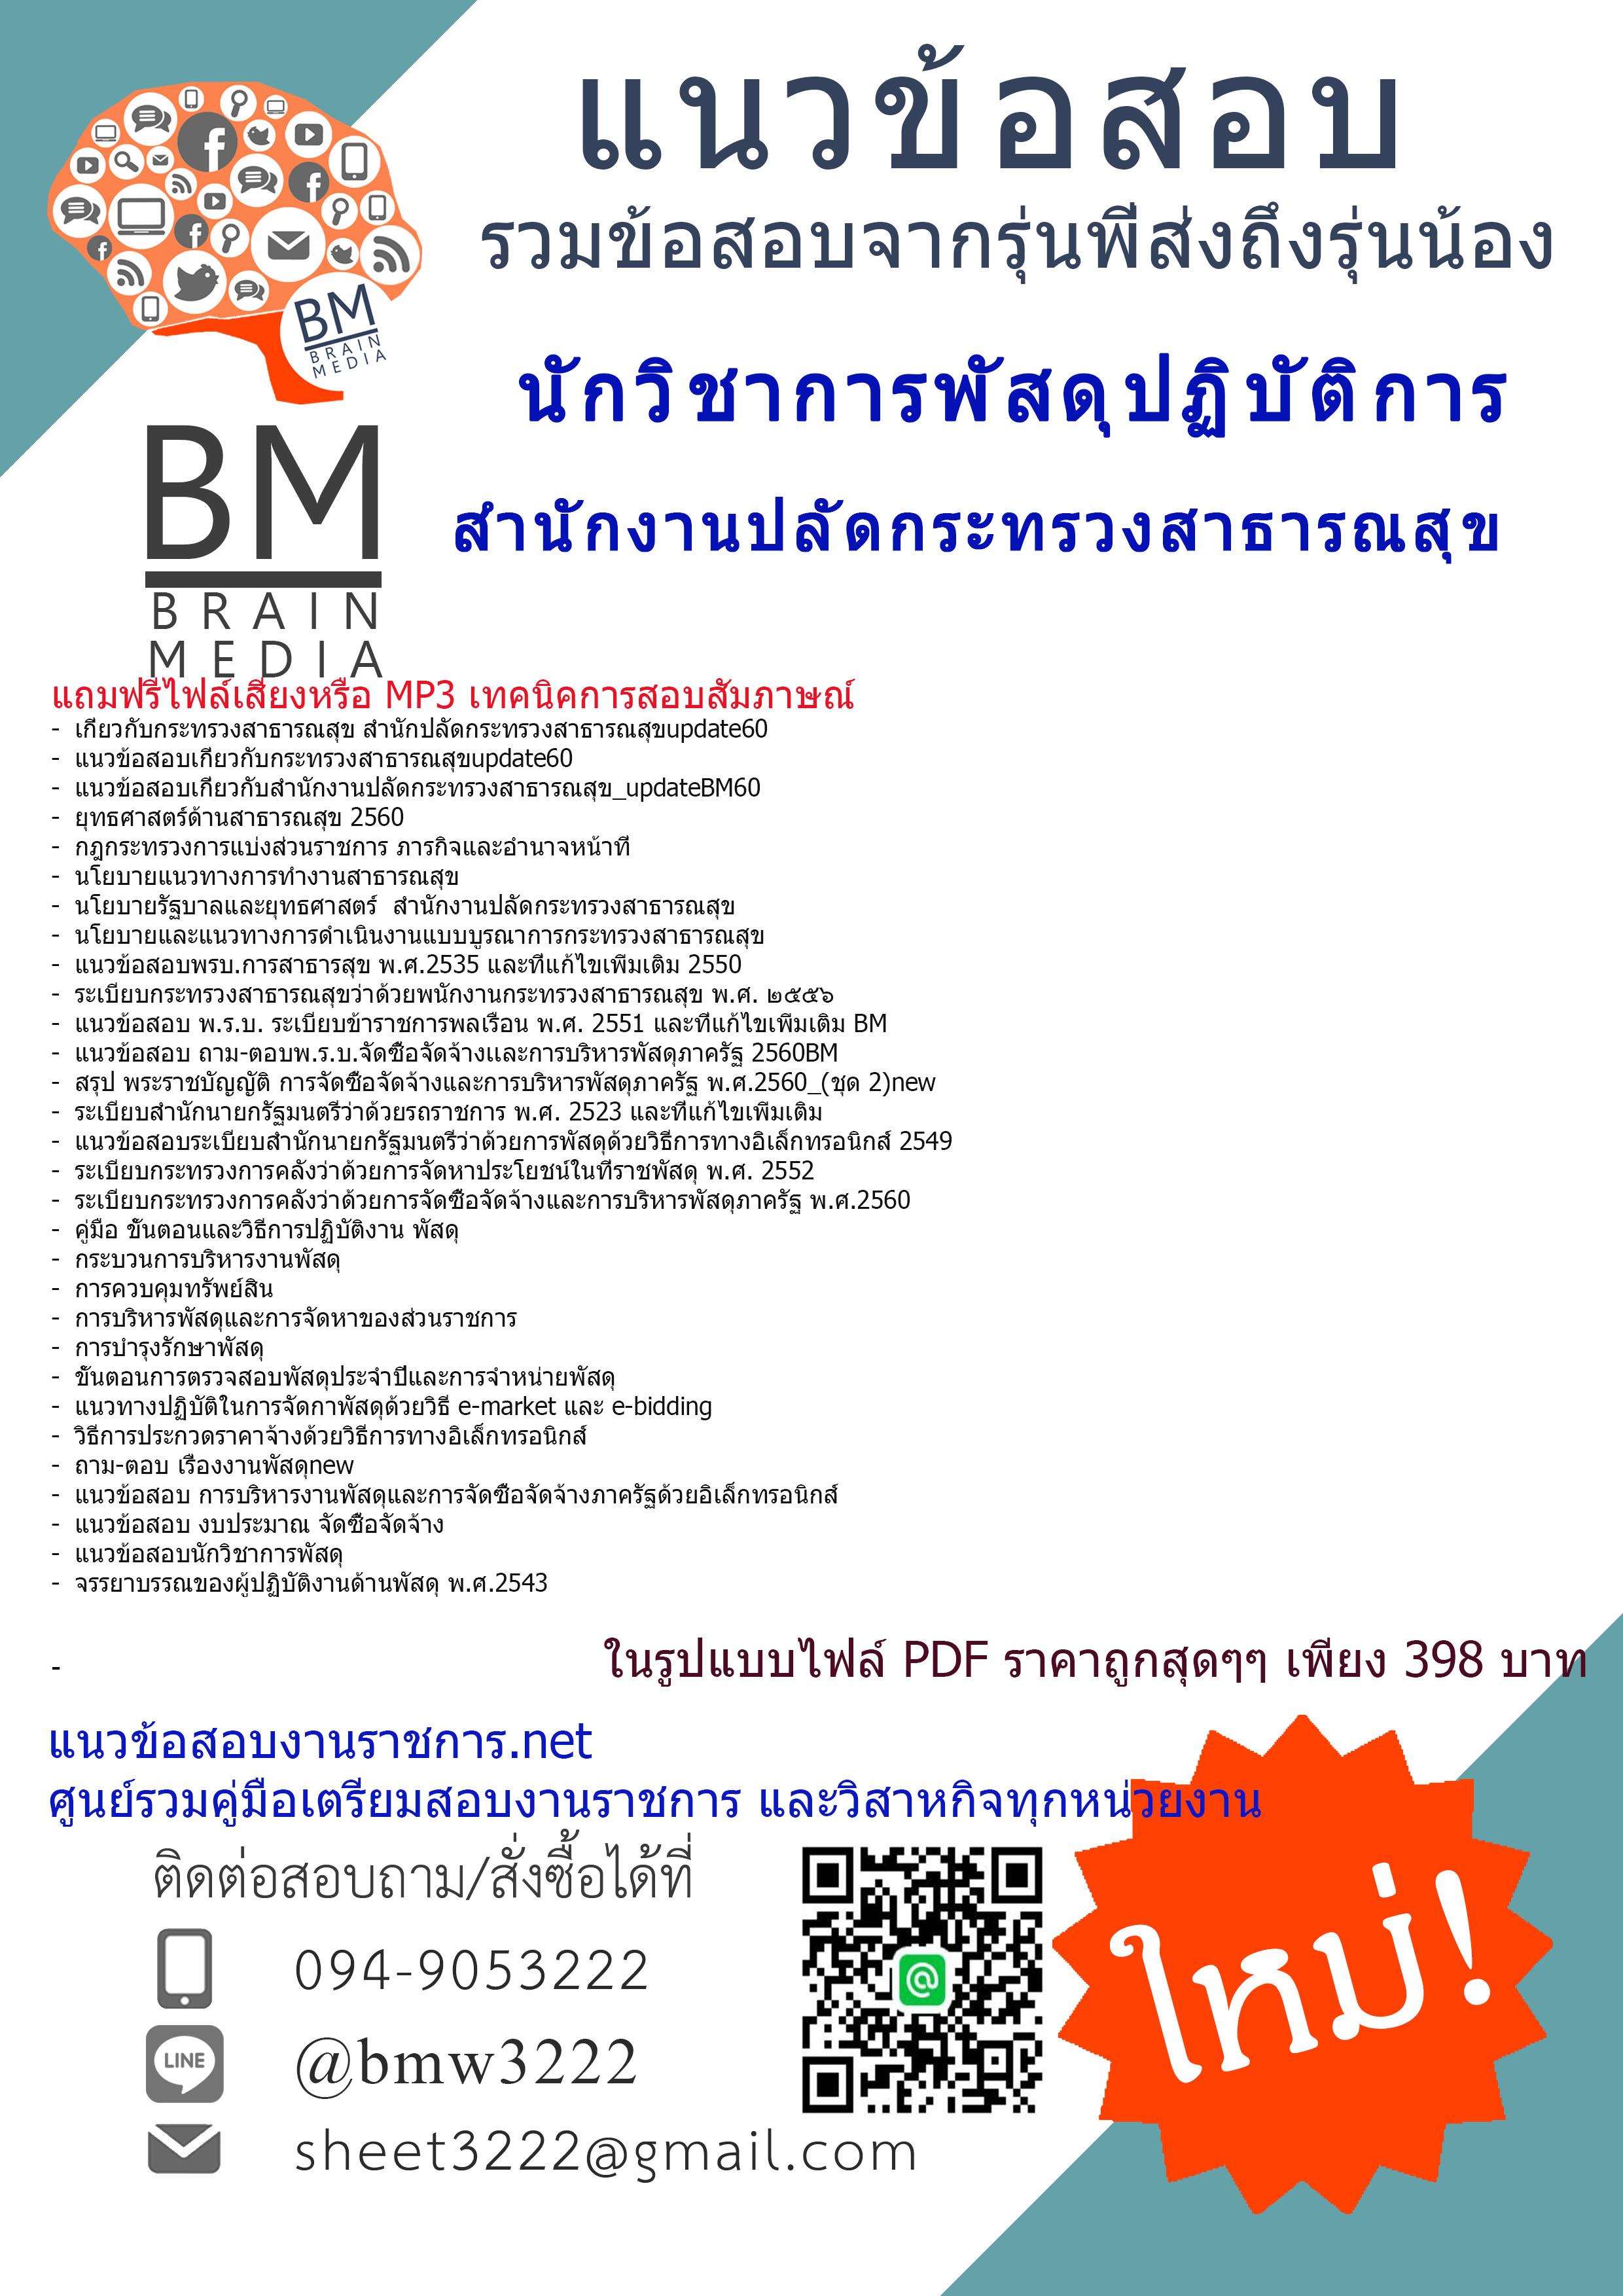 (((updateสุด!!)))แนวข้อสอบนักวิชาการพัสดุปฏิบัติการสำนักงานปลัดกระทรวงสาธารณสุข